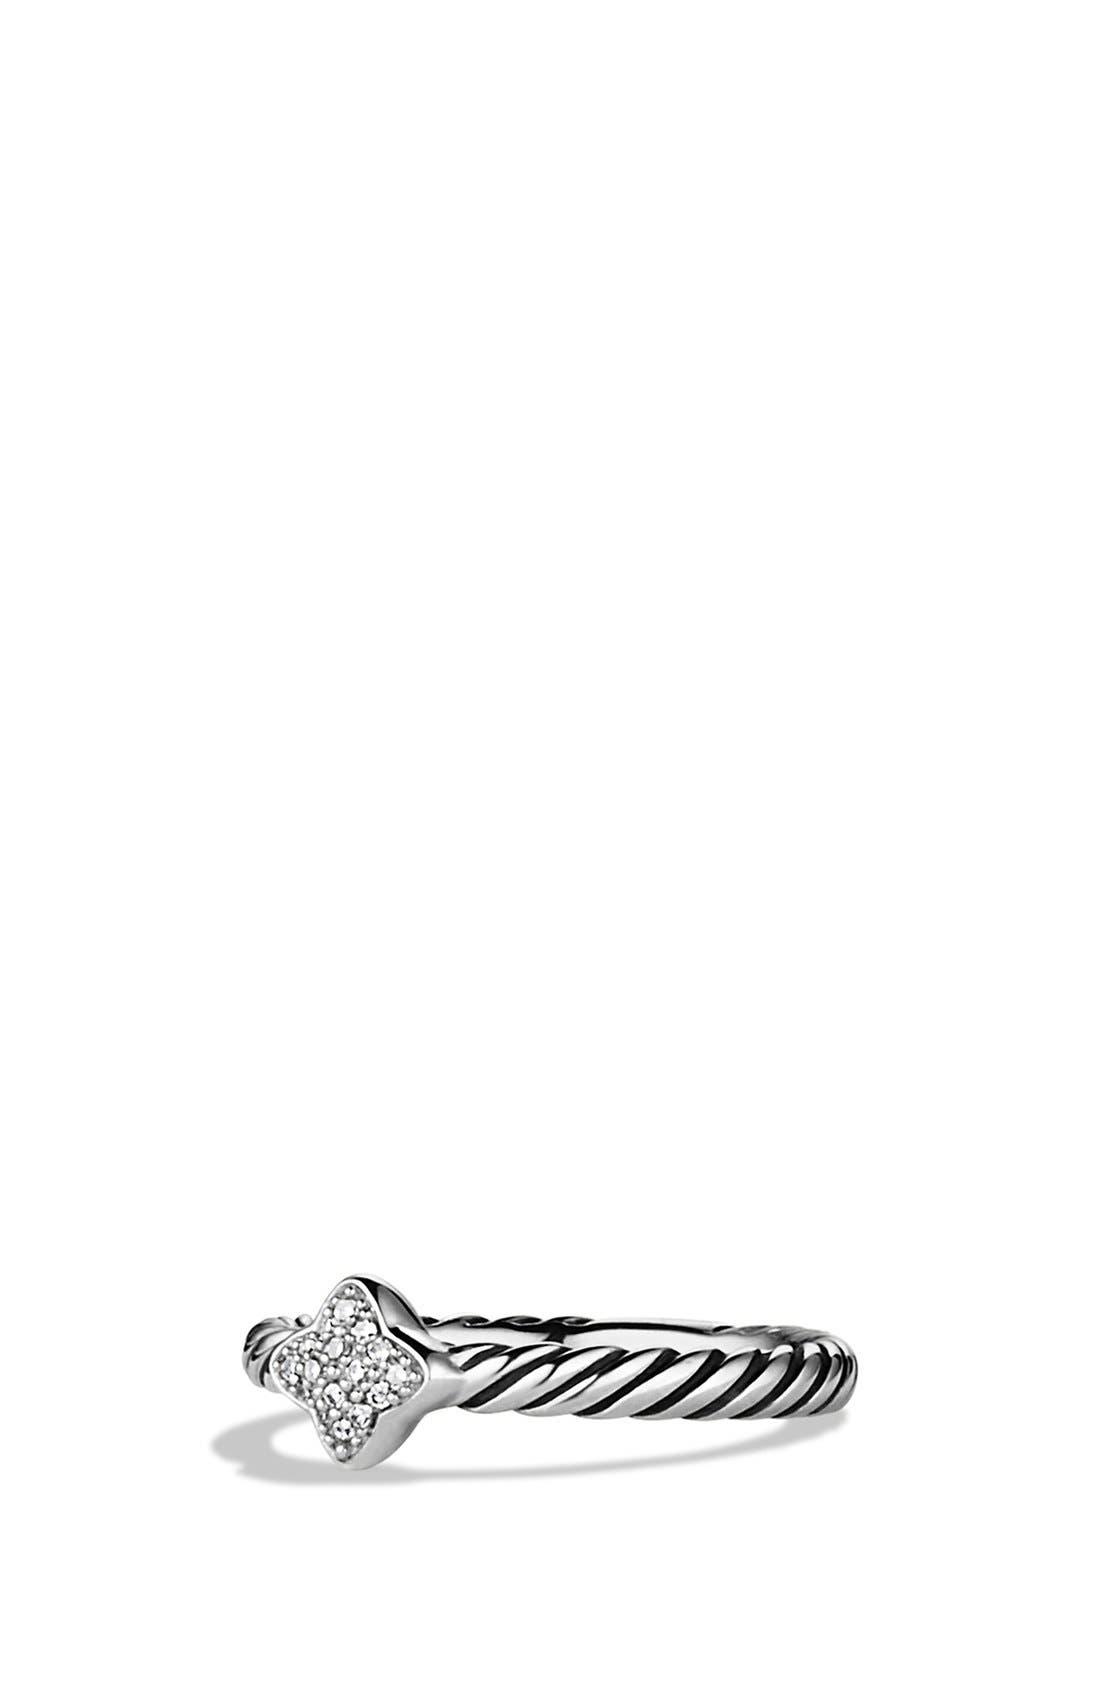 'Cable Collectibles - Quatrefoil' Ring with Diamonds,                             Main thumbnail 1, color,                             DIAMOND